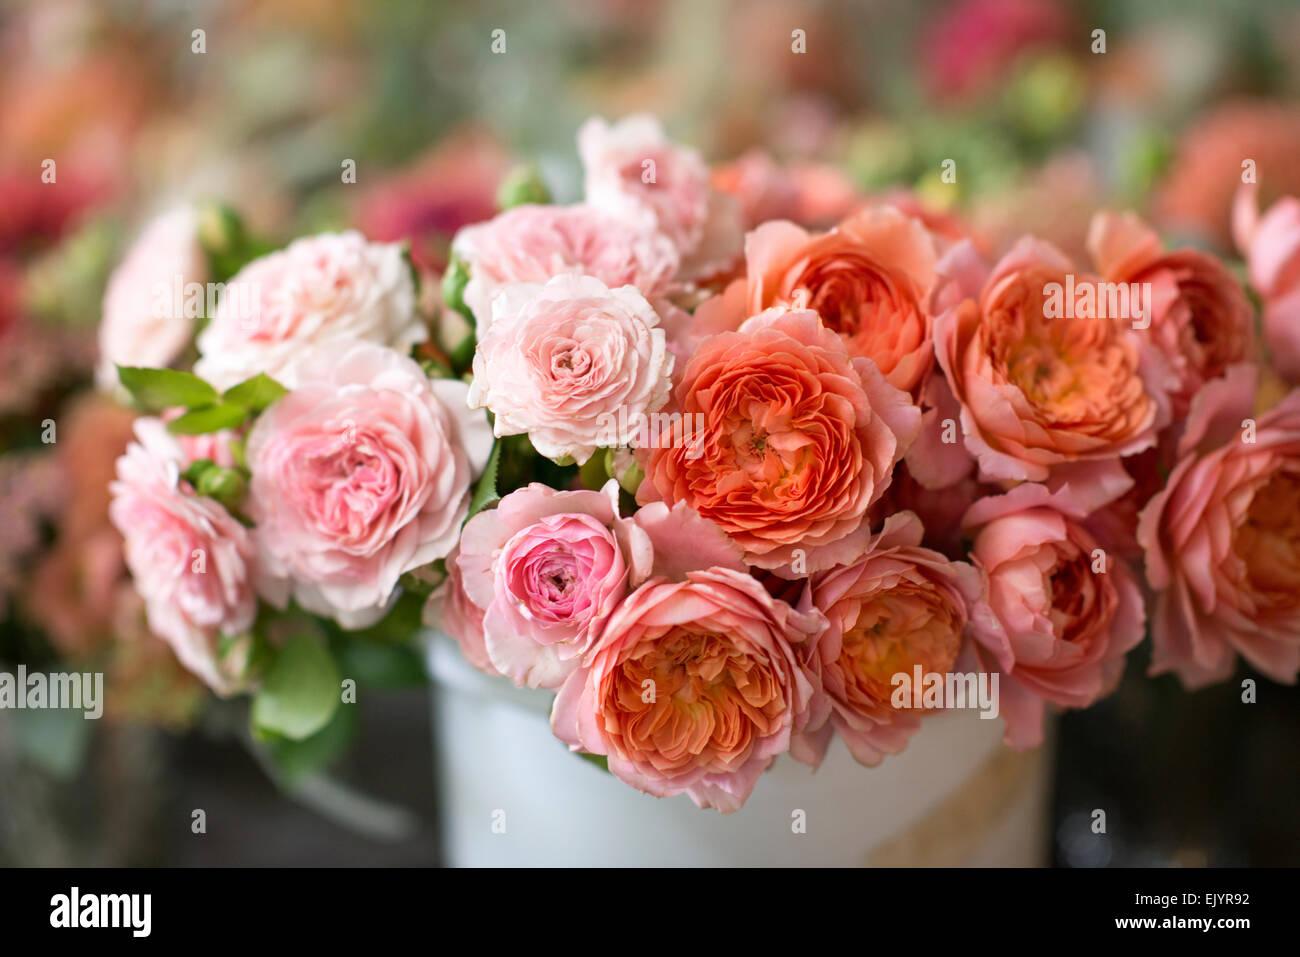 Rosa-Karamel-Antike und Romantik Antike Stockbild